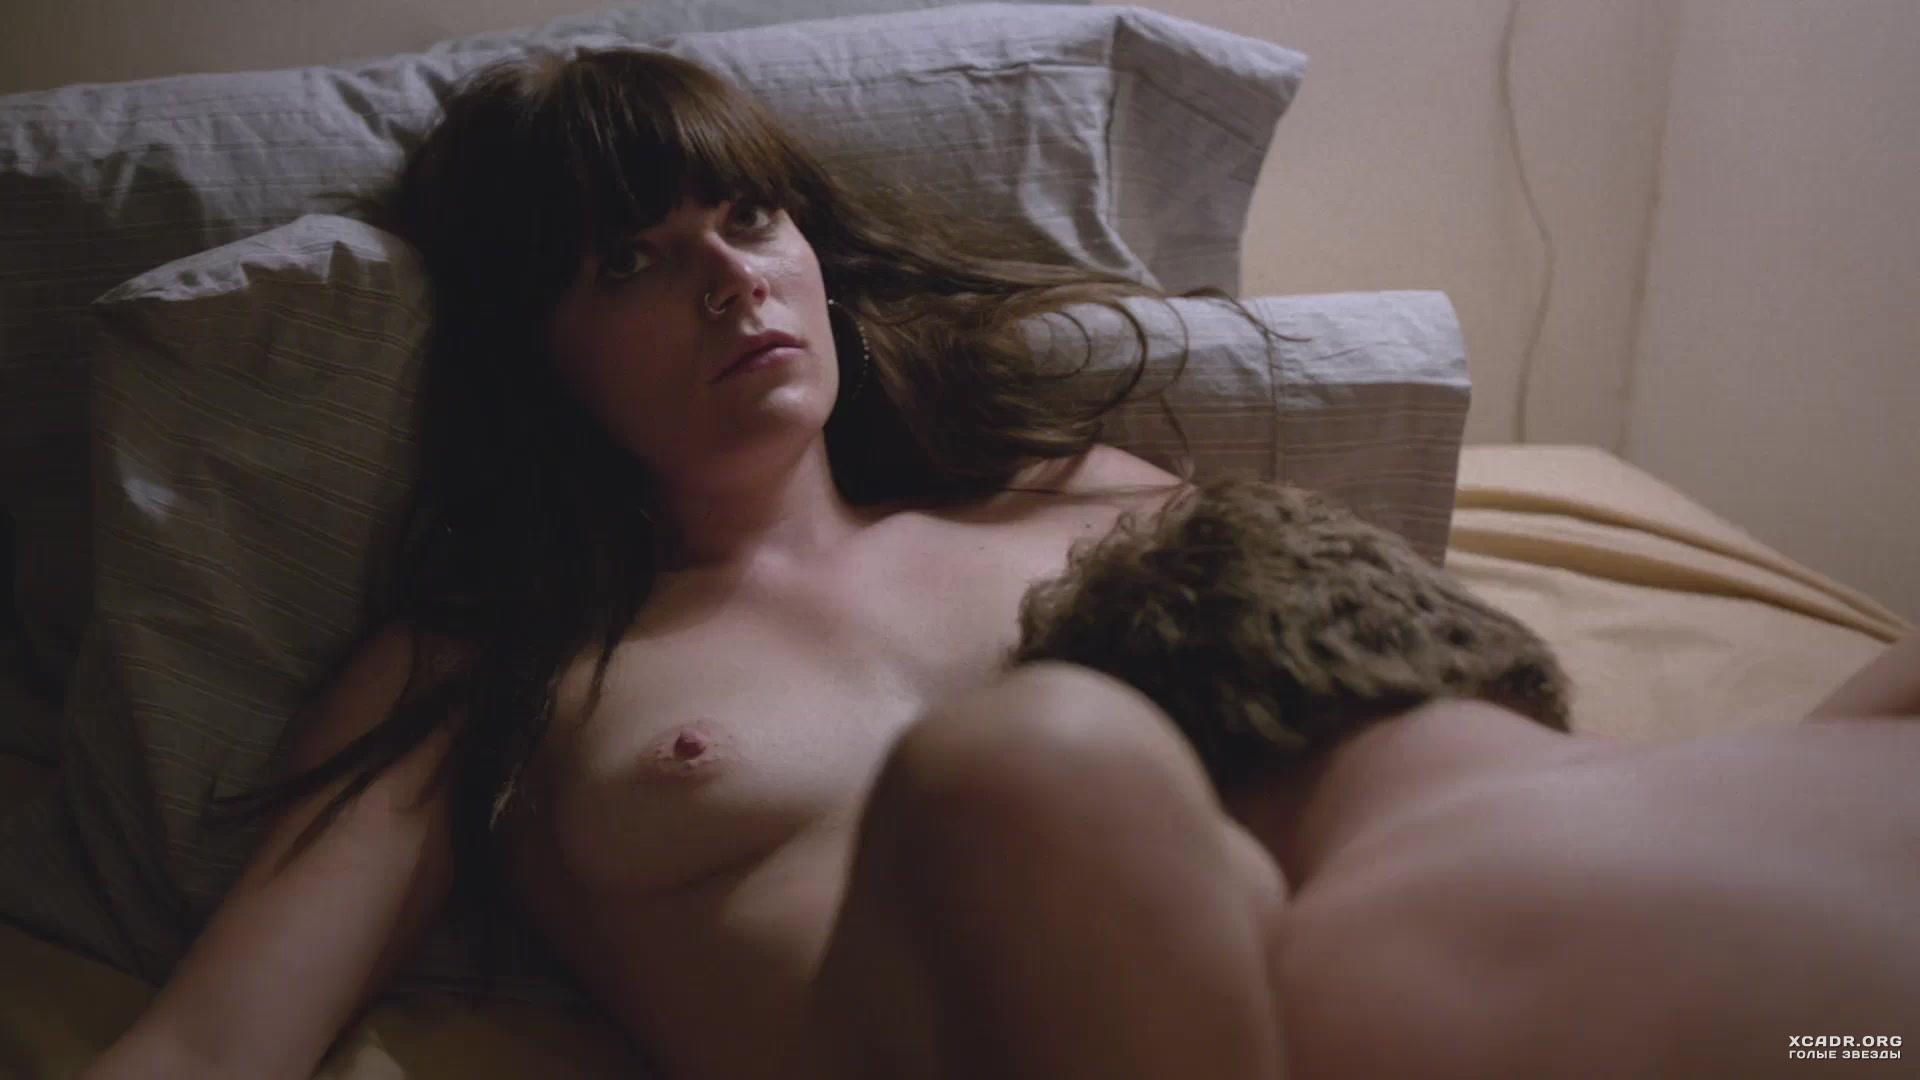 Stephanie amateur nude jacinda, lesbian get pussy shocked